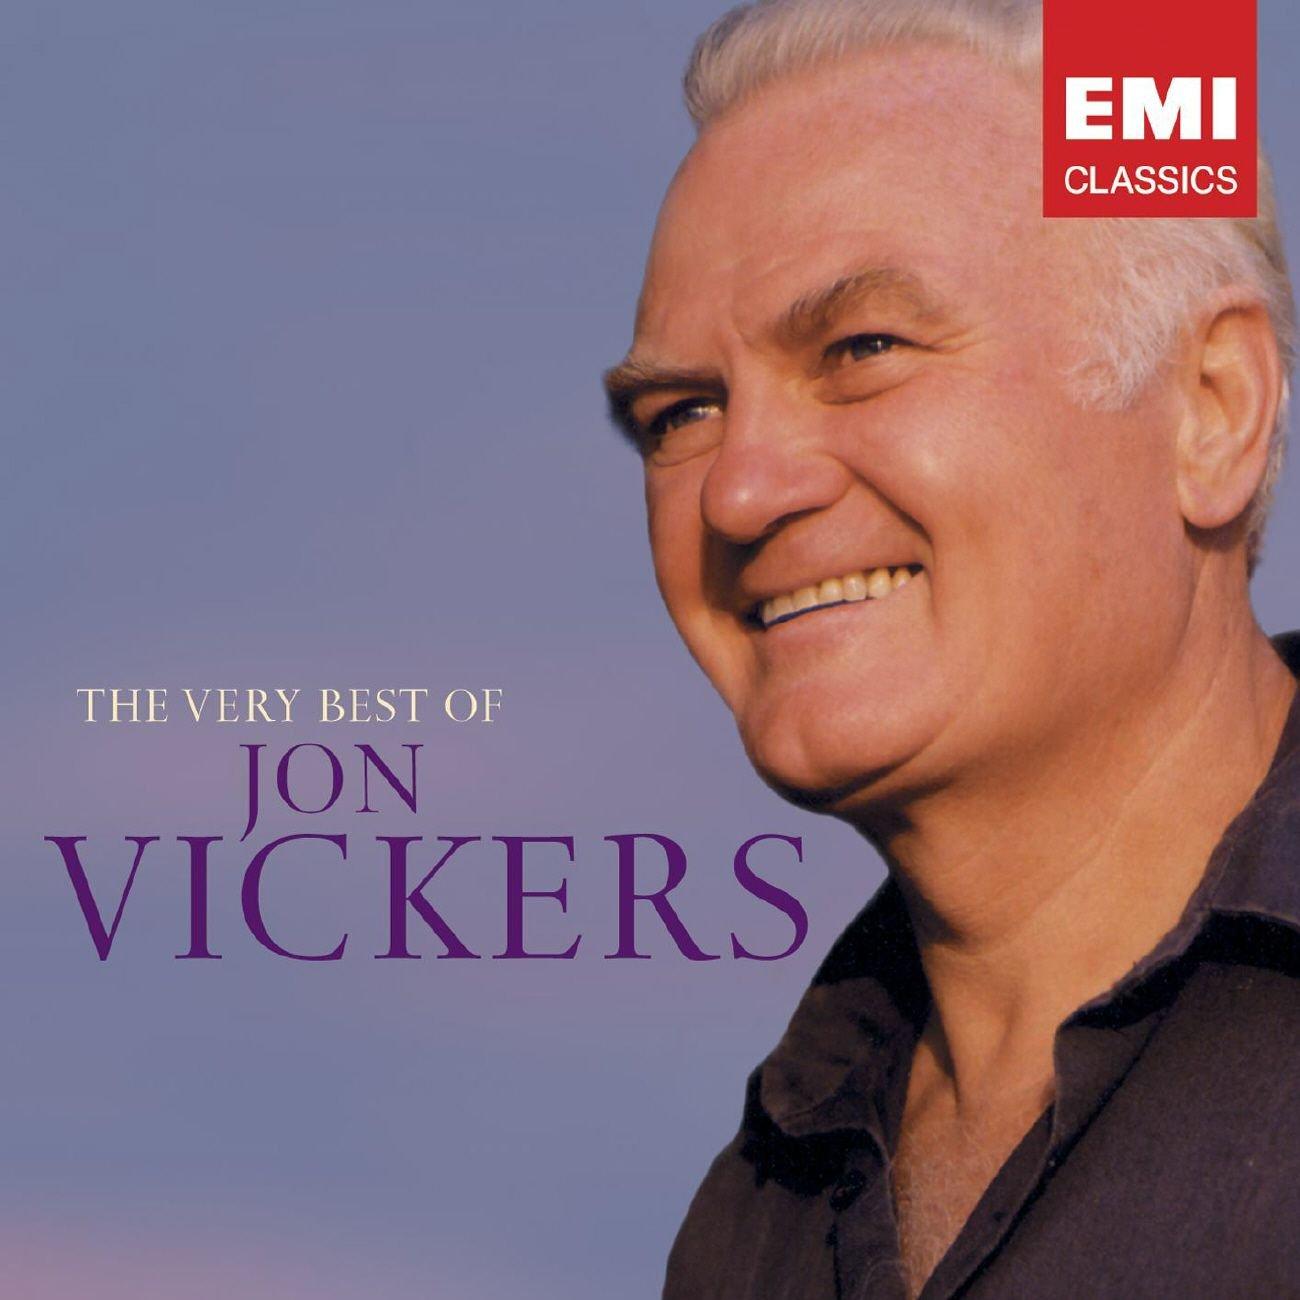 Very Best of Jon Vickers